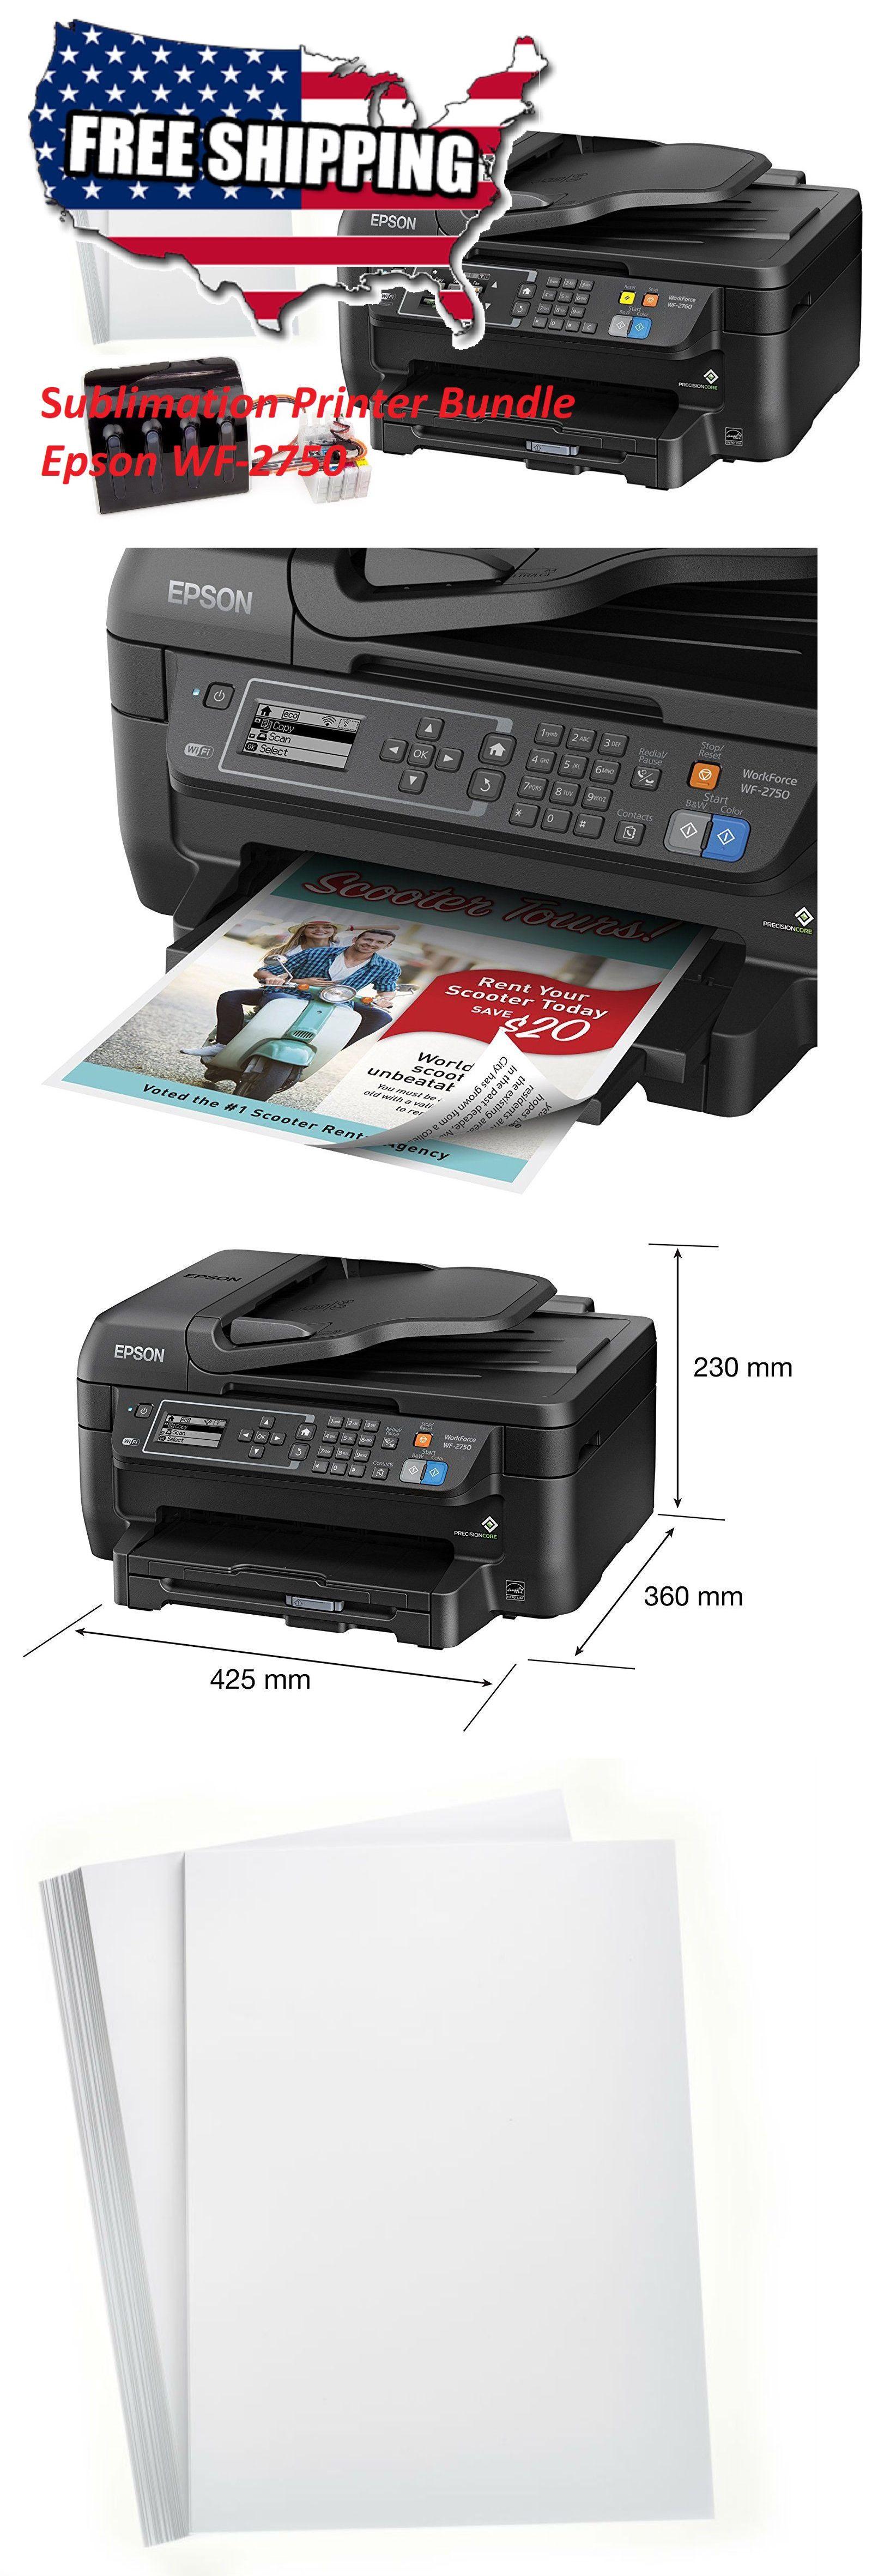 Printers 1245: Epson Wf-2750 Sublimation Printer Bundle Ciss Kit